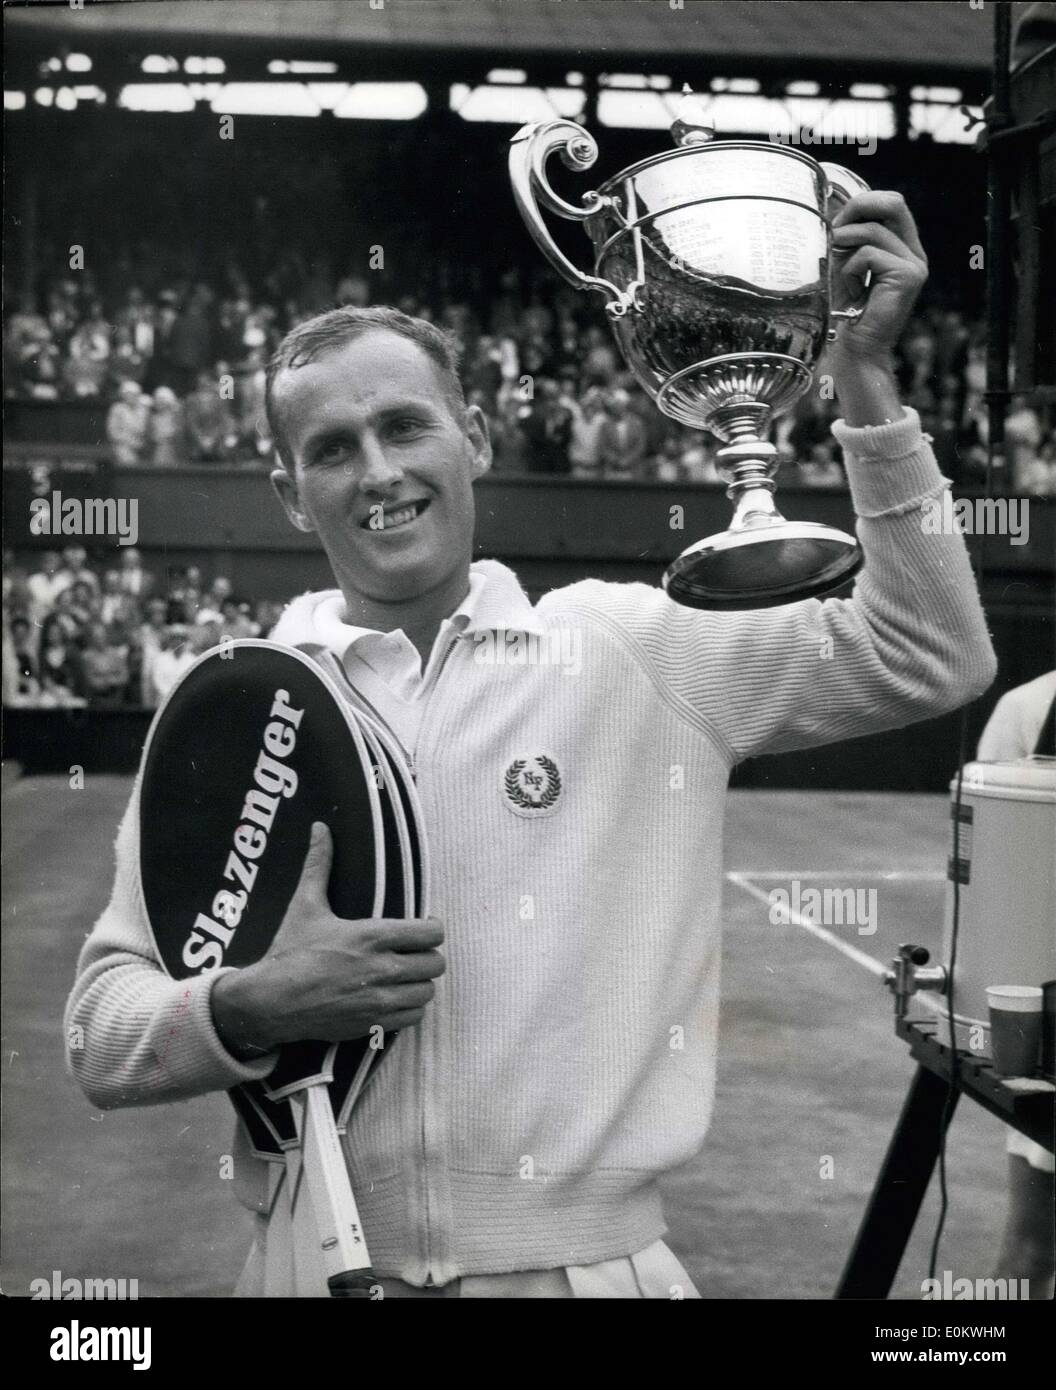 Jul 02 1950 Men s Singles Final At Wimbledon shows